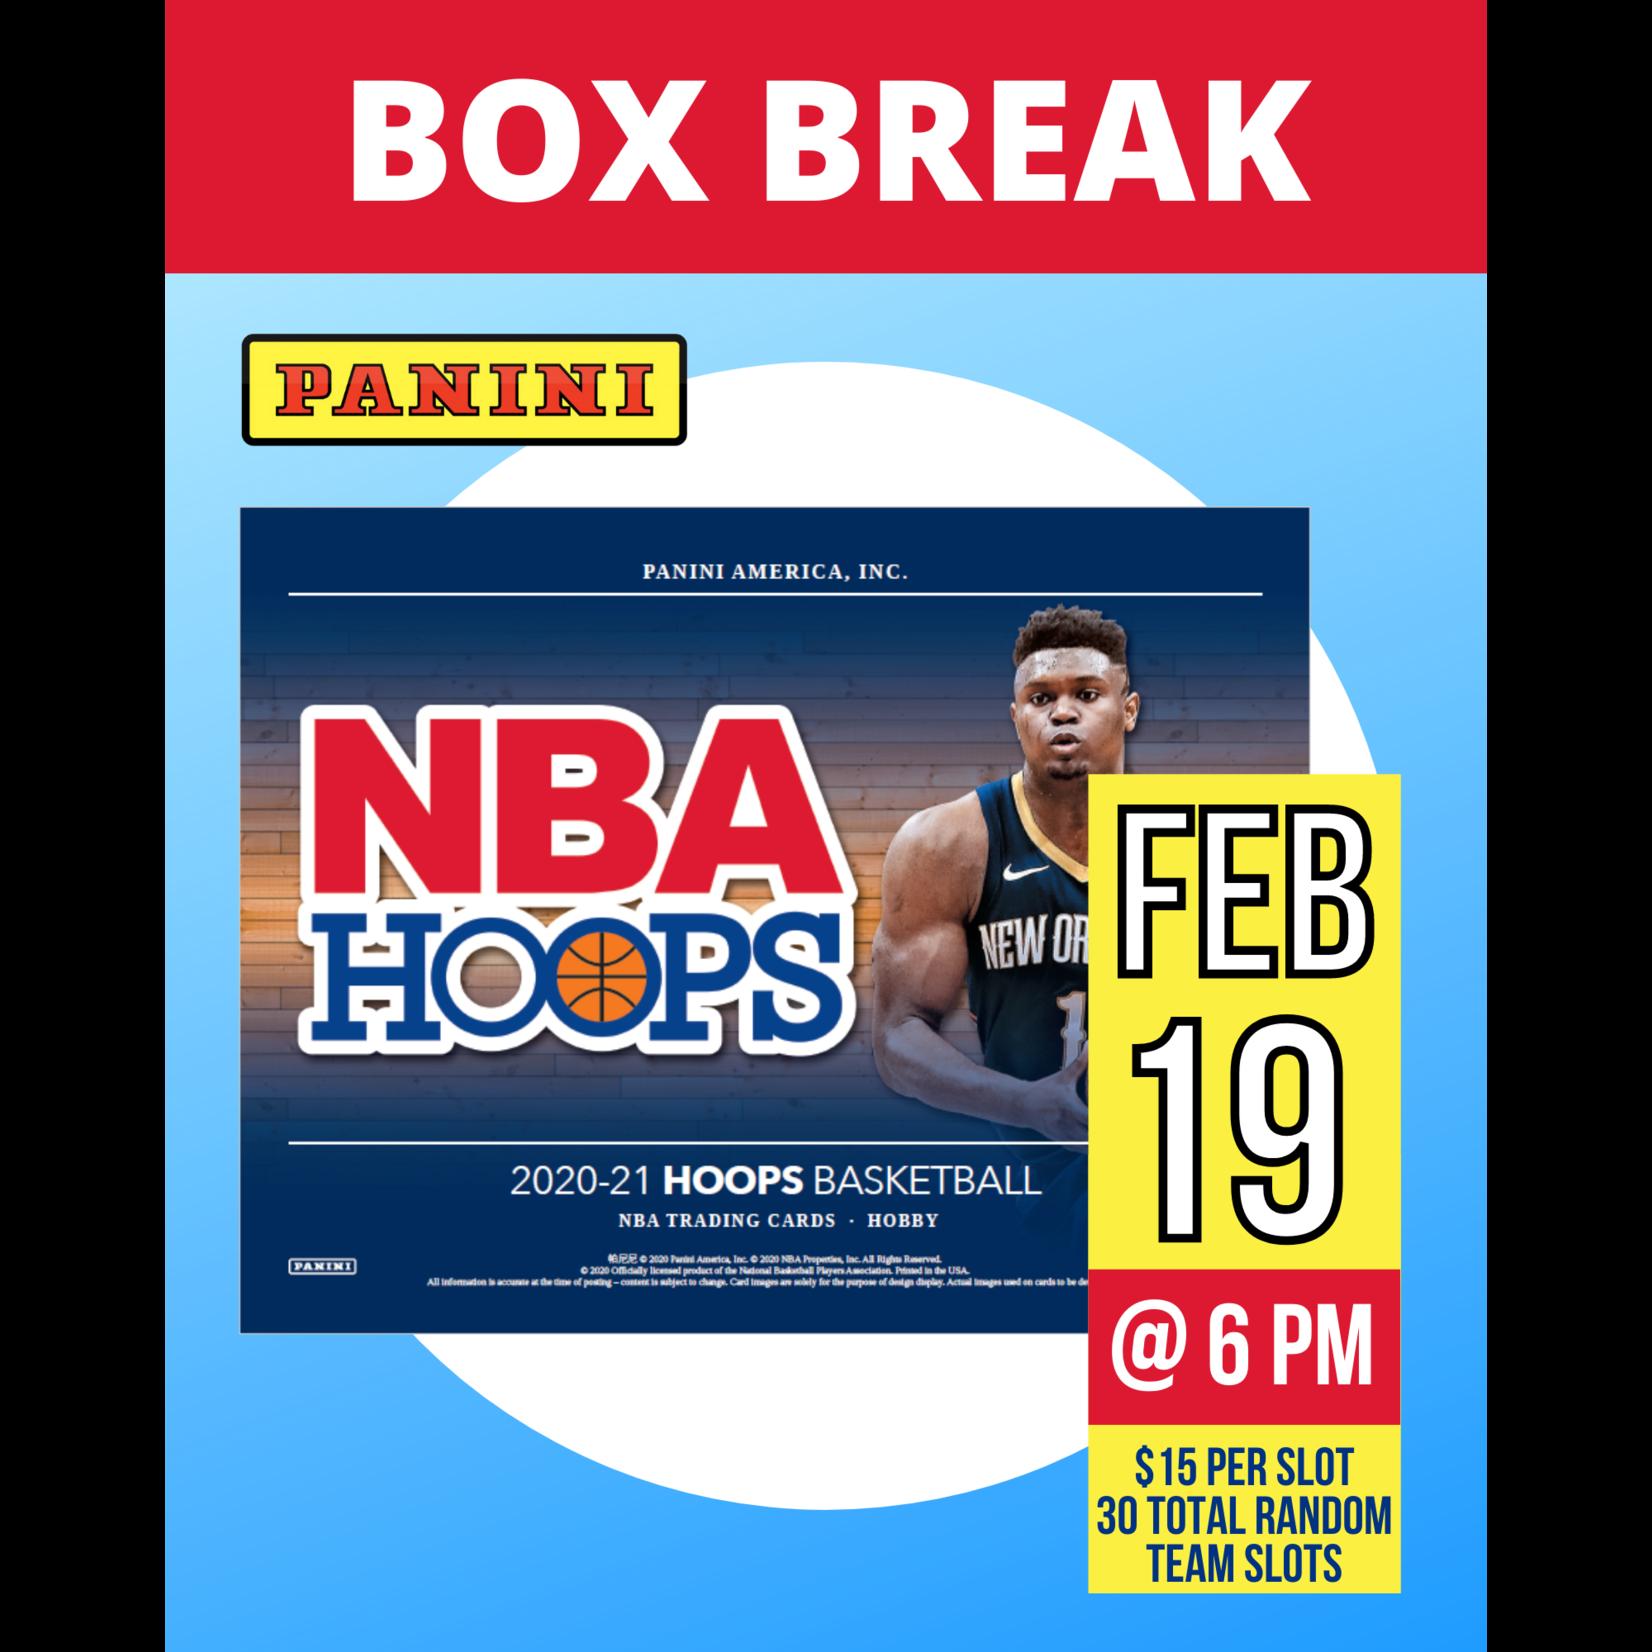 Panini America Basketball Break 2020-21 Hoops Basketball - 1 Random Team Slot